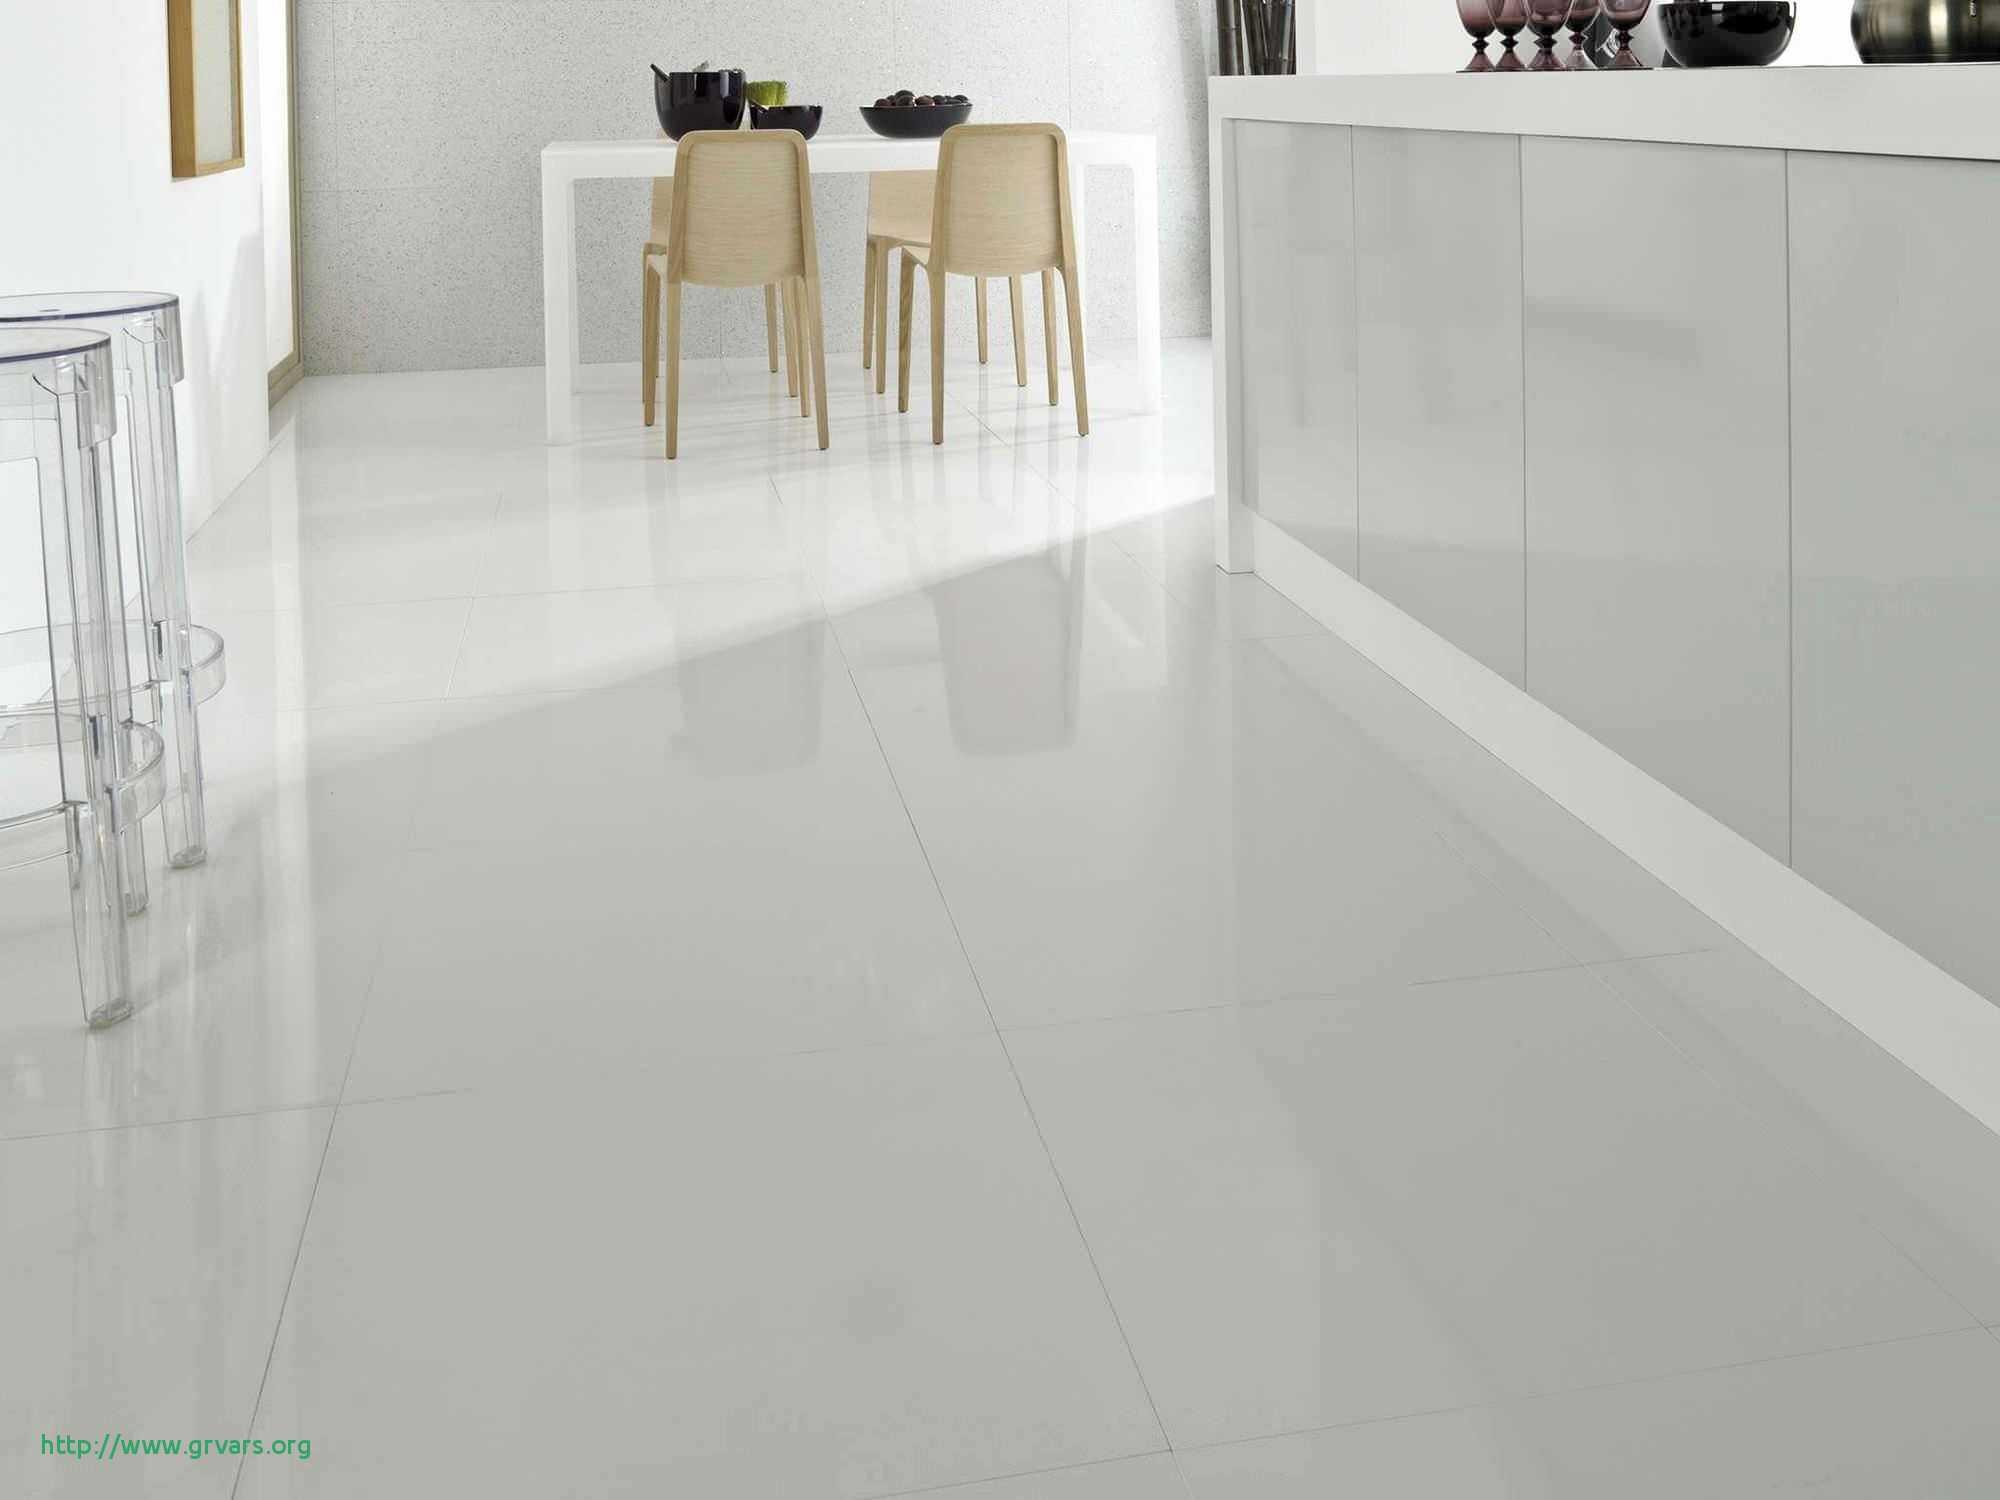 bruce hardwood flooring denver of 24 beau elite flooring and design ideas blog throughout elite flooring and design a‰lagant lovely interiors design deep clean tile floor inspirational egal od